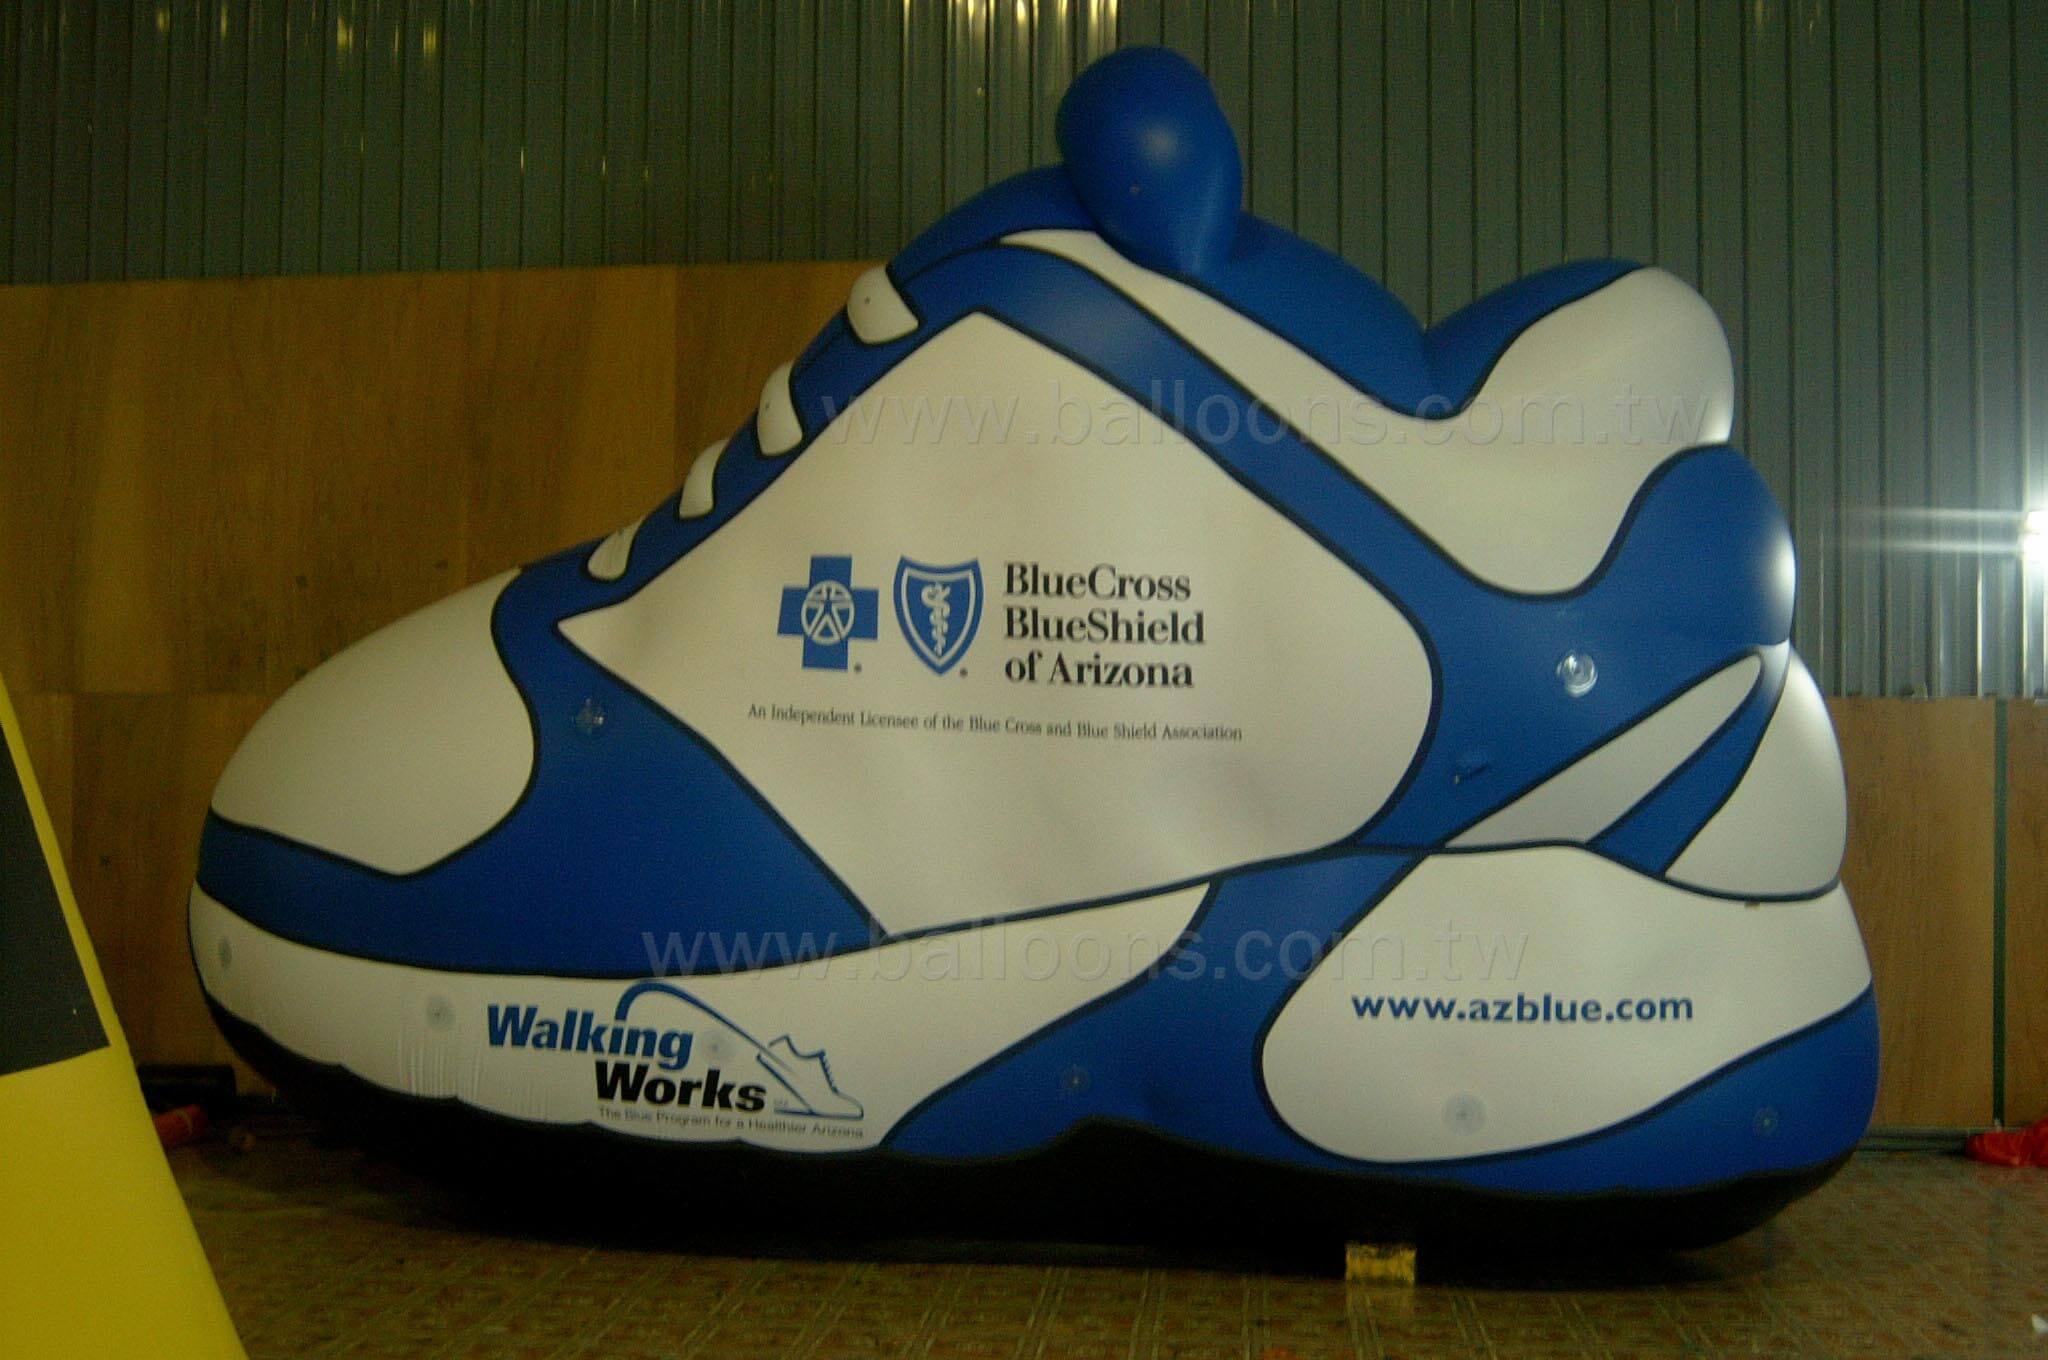 Advertising Shoe balloons客製化藍白運動球鞋廣告氣球